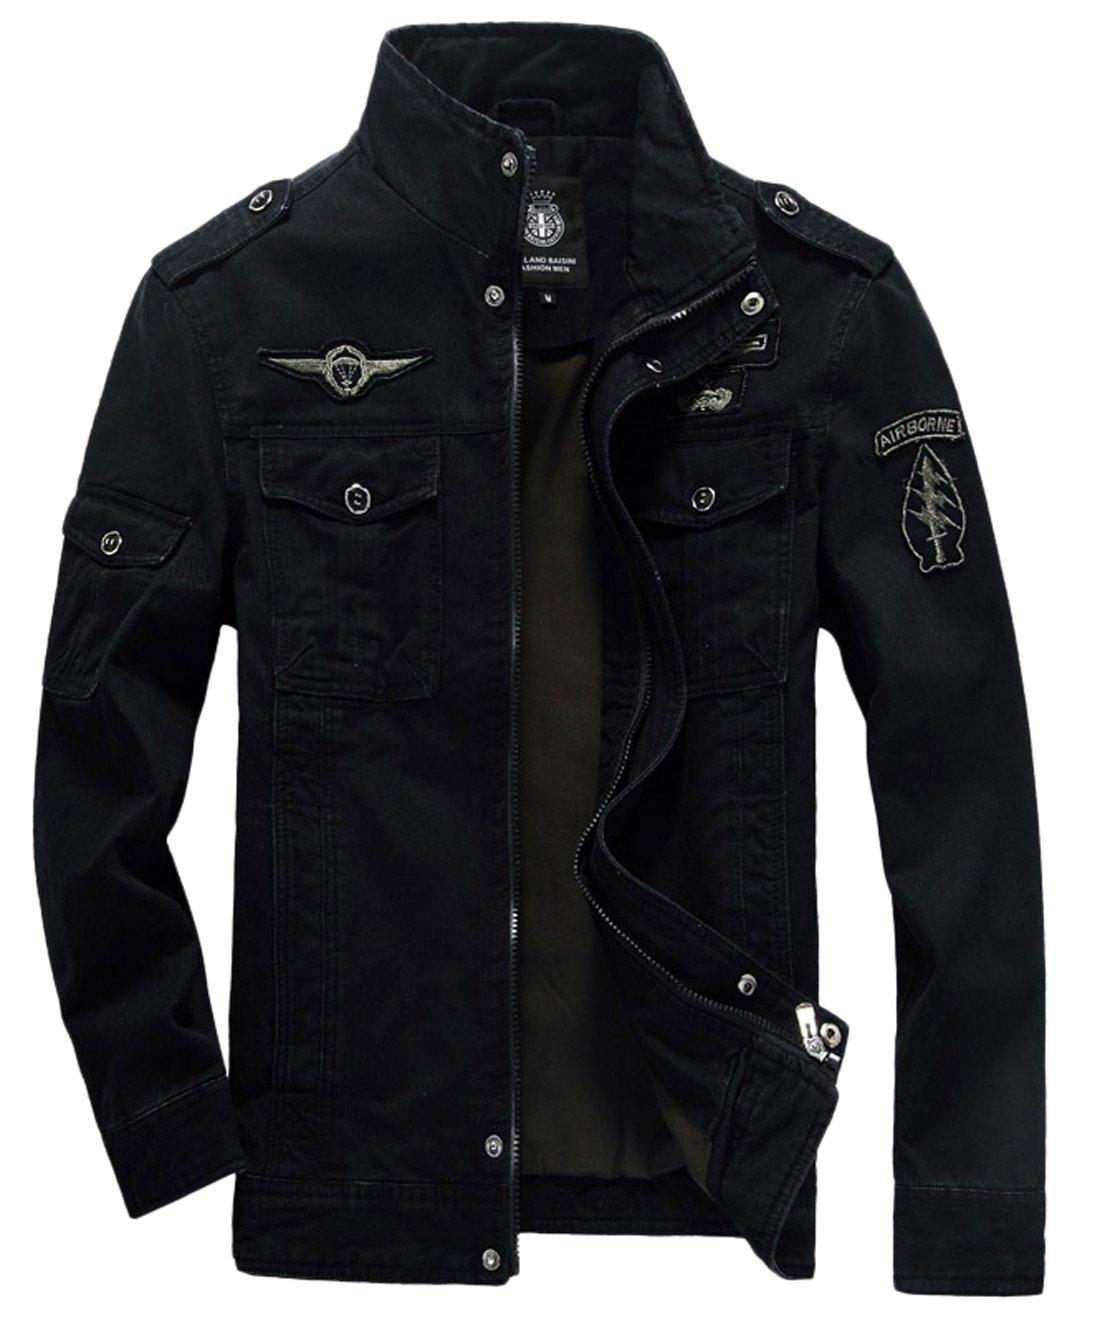 Chouyatou Men's Casual Lightweight Zip Cotton Harrington Jacket Windbreaker (Small, Black)